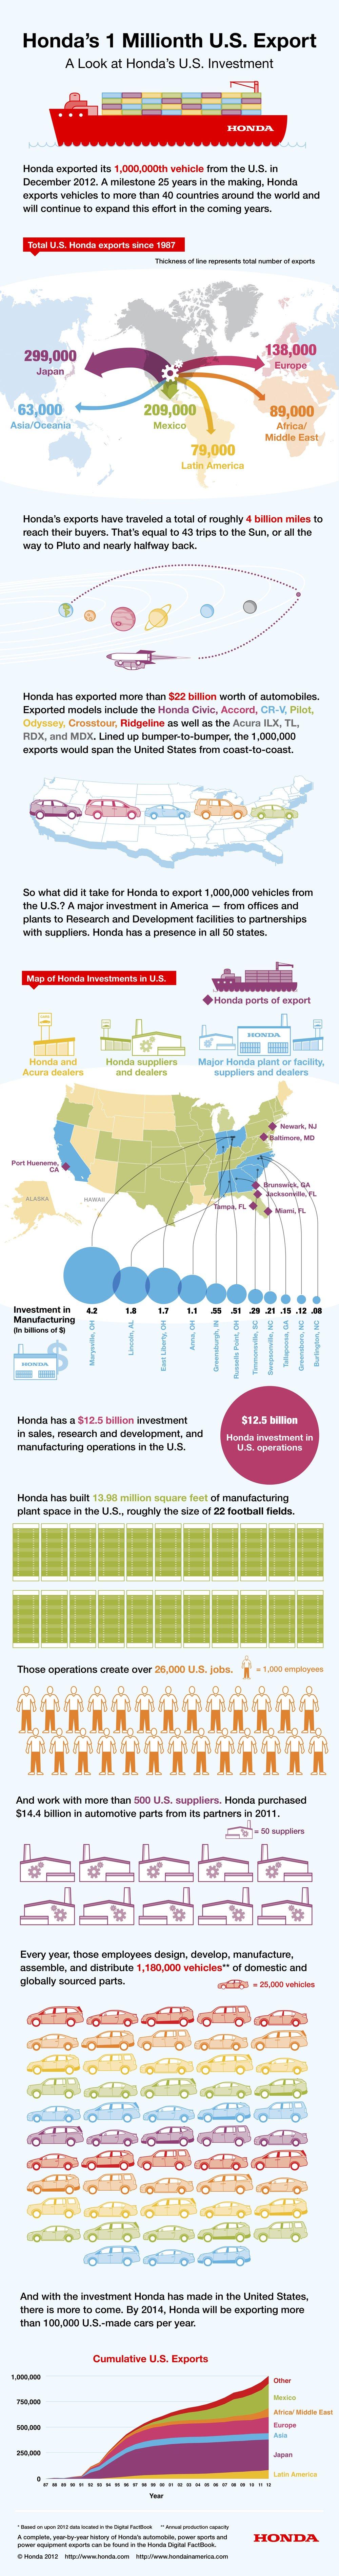 Honda's 1 Millionth U.S. Export